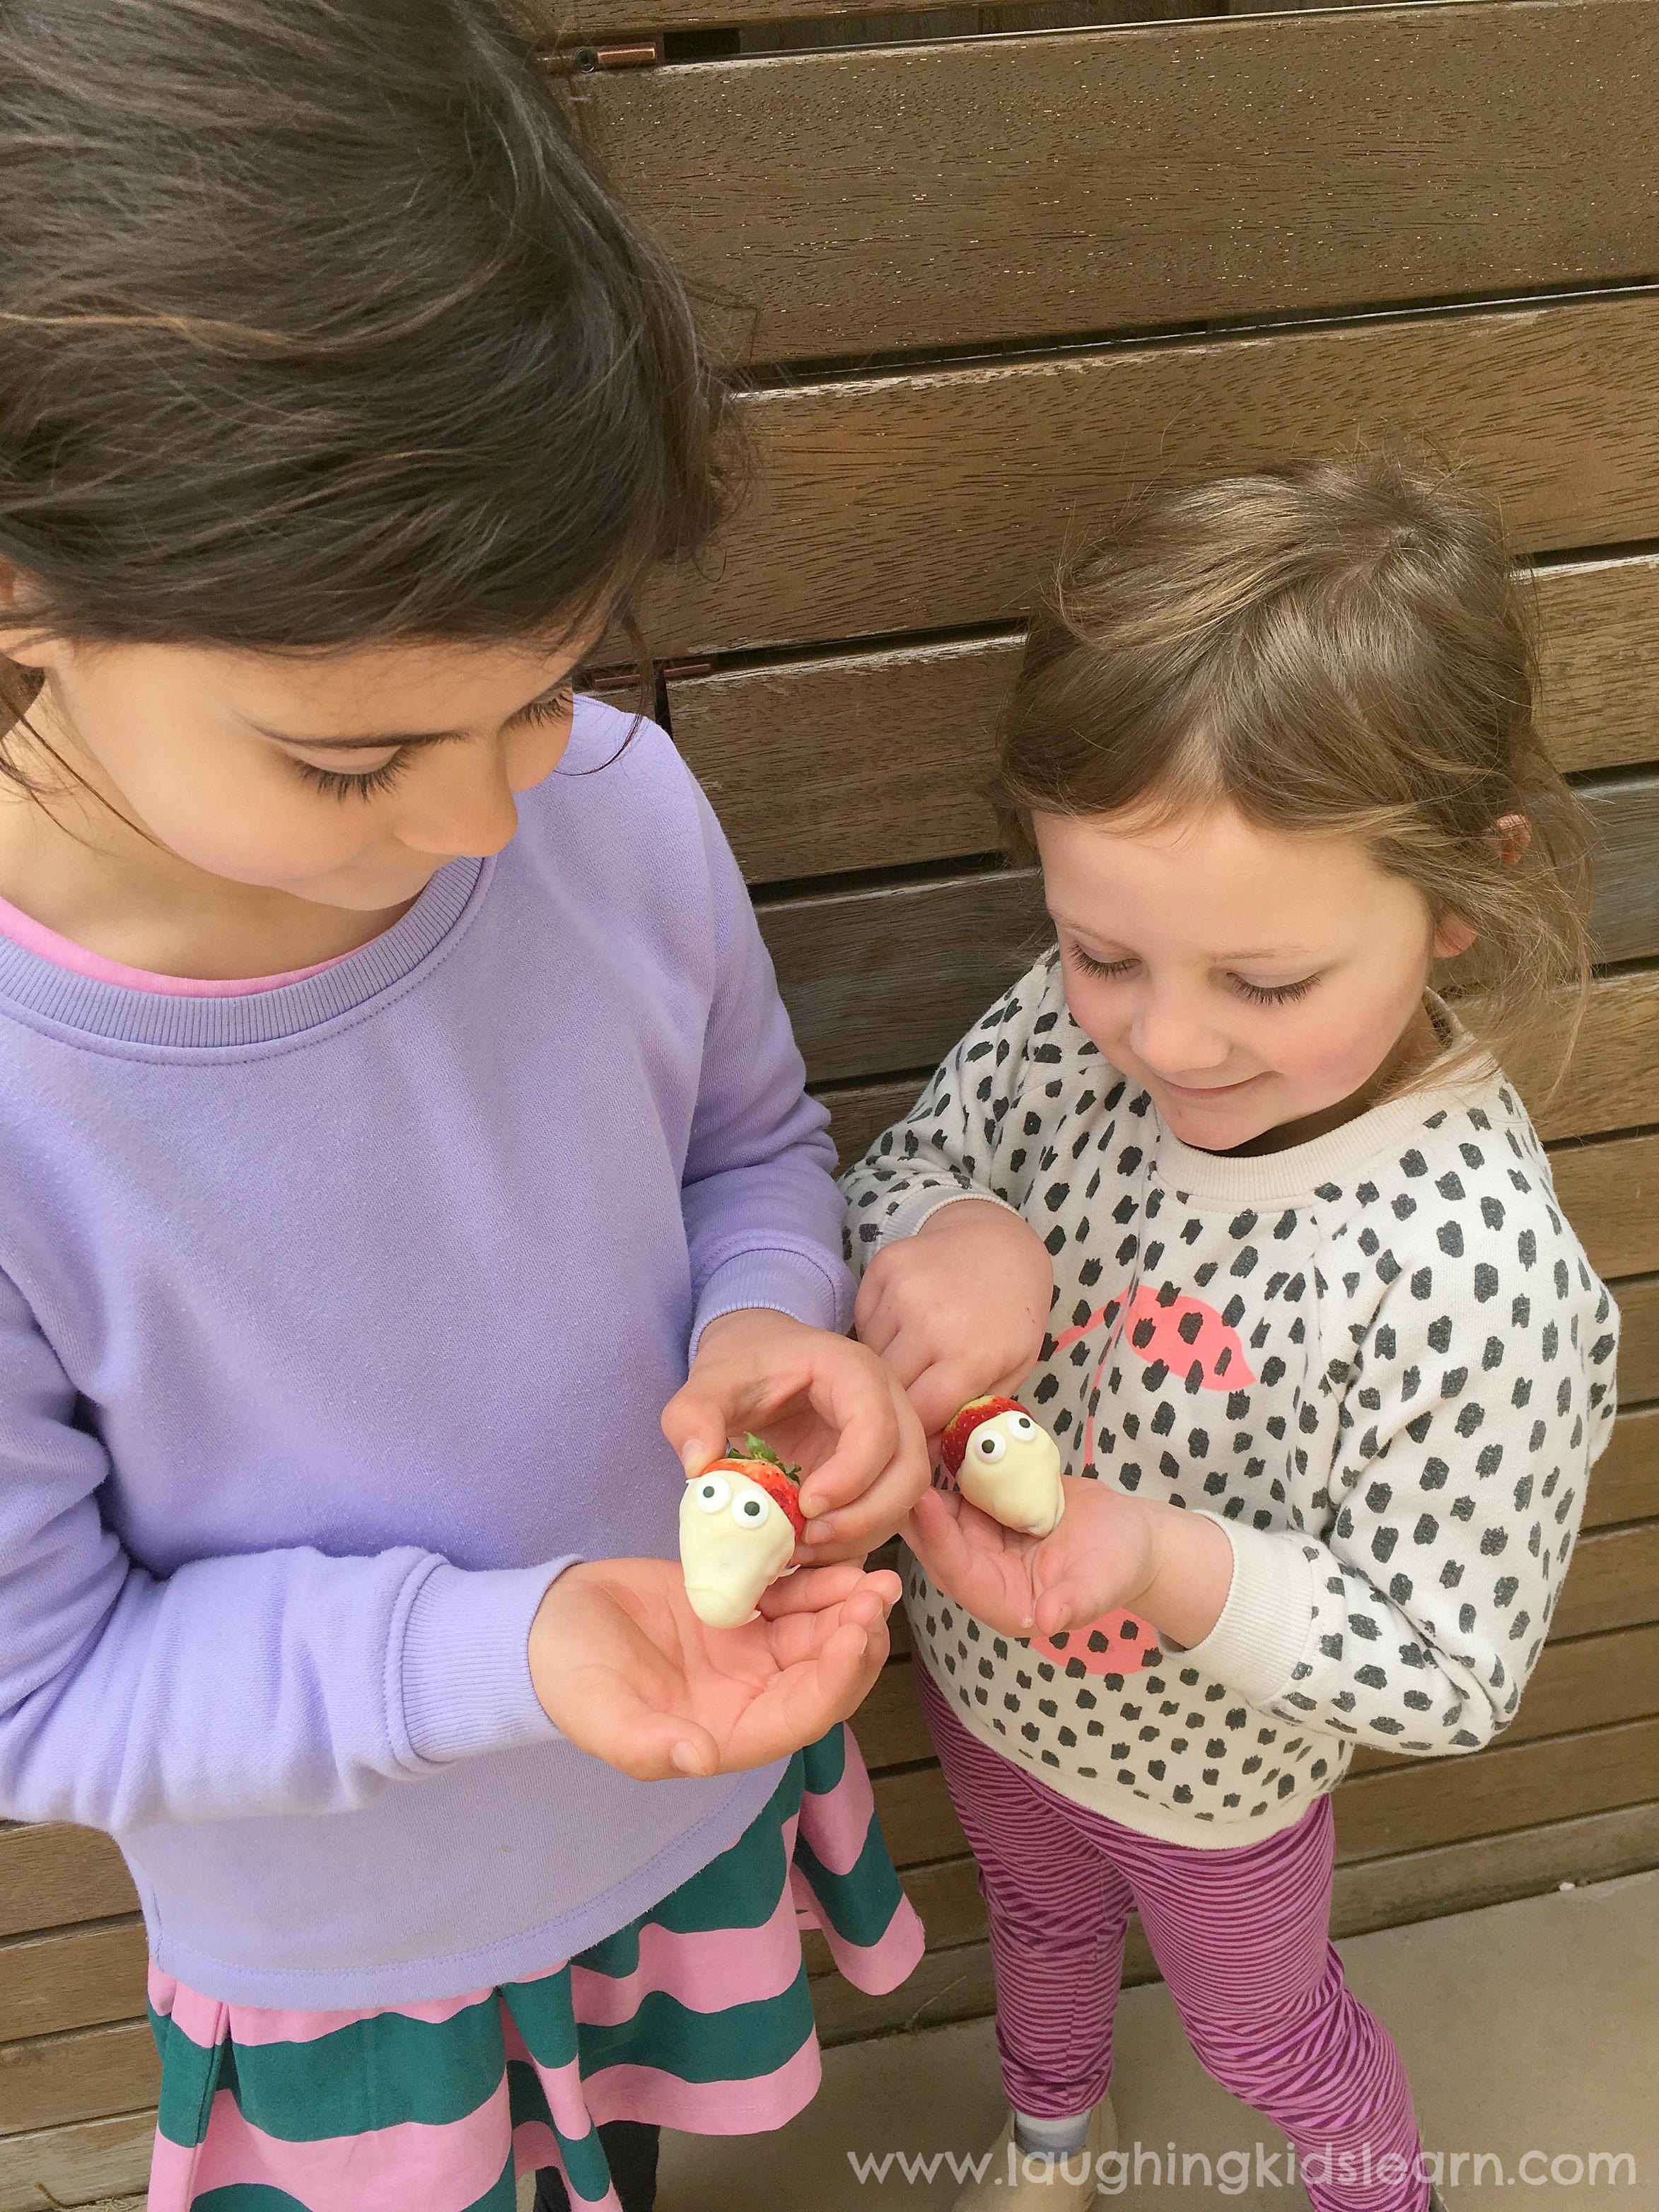 children with chocolate strawberries